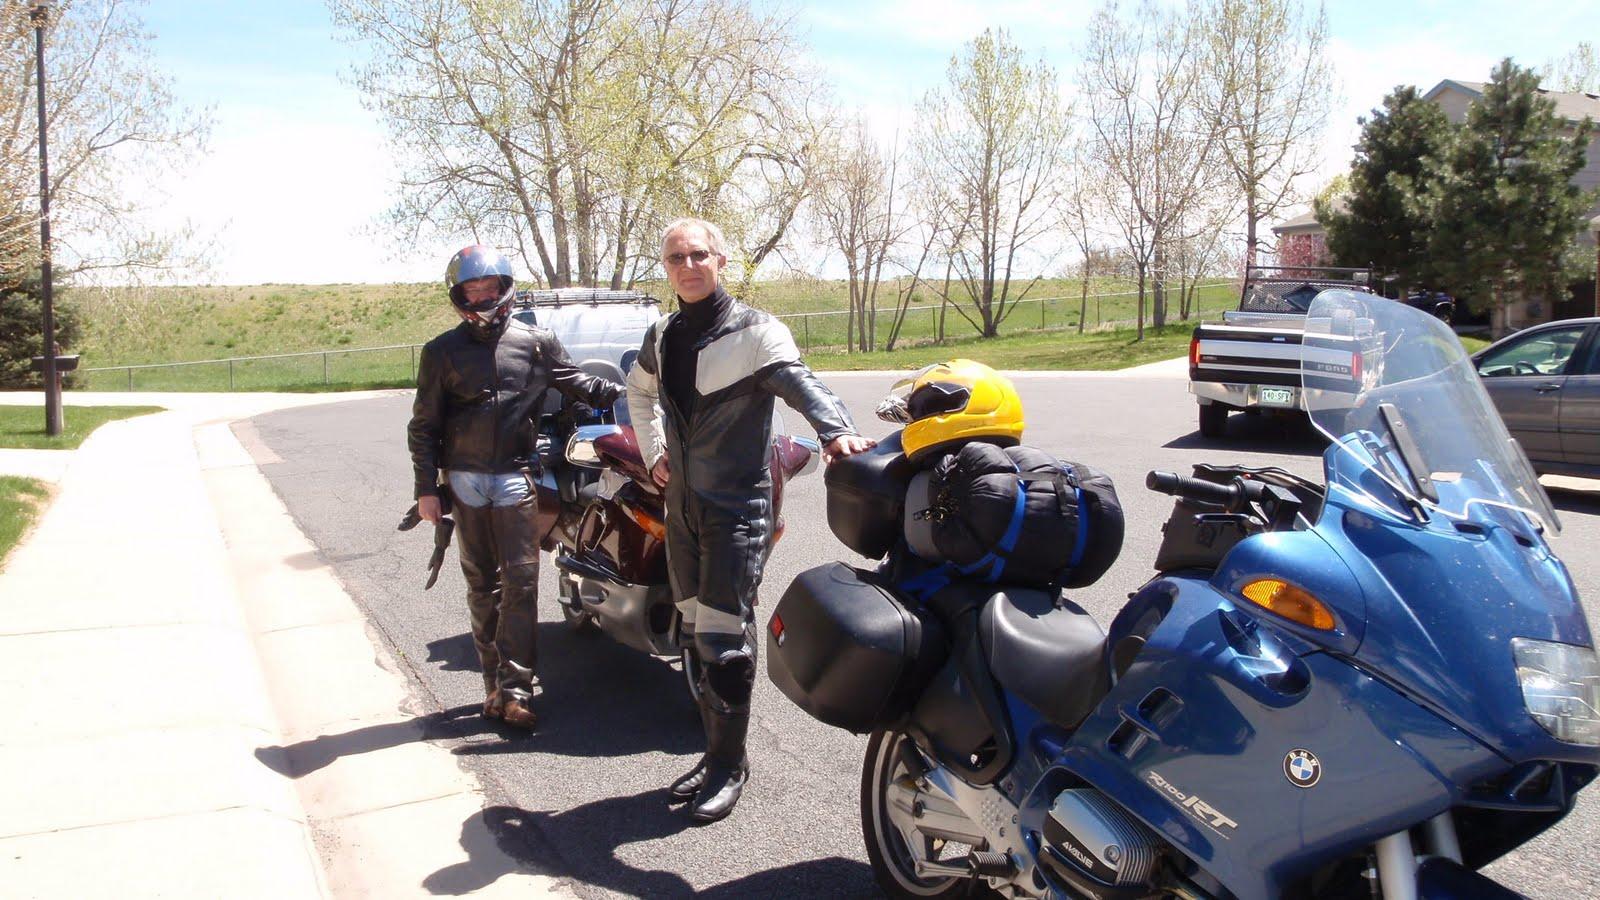 ricci a jeho moto cesta amerikou 2010 cestopis na motorce motork. Black Bedroom Furniture Sets. Home Design Ideas